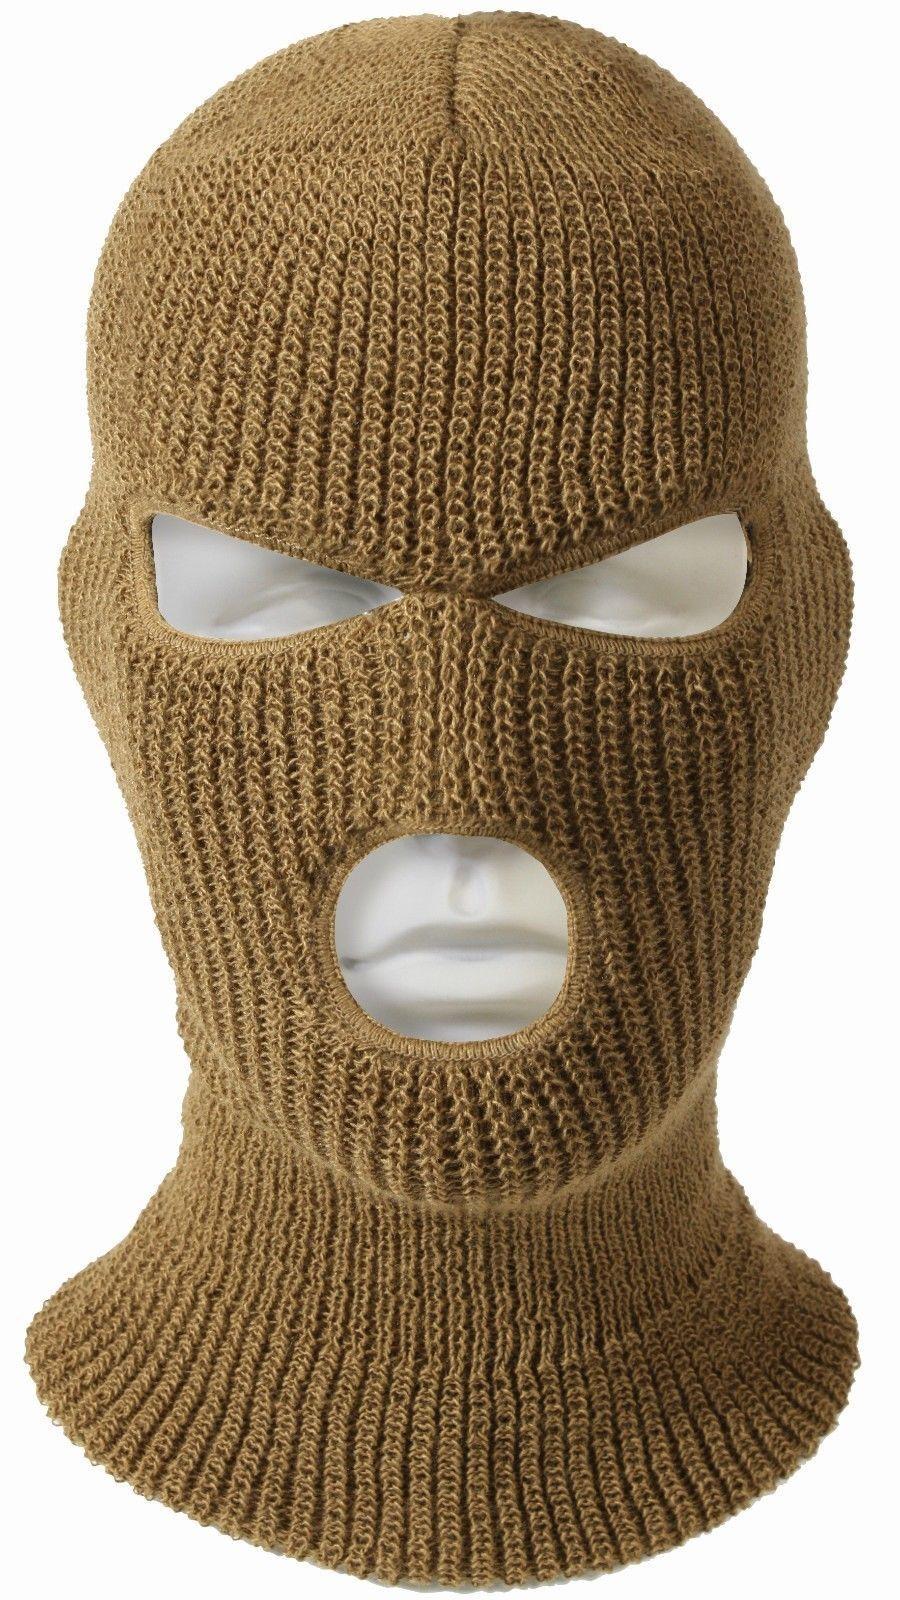 3 Hole Face Mask Ski Mask Winter Cap Balaclava Hood Army